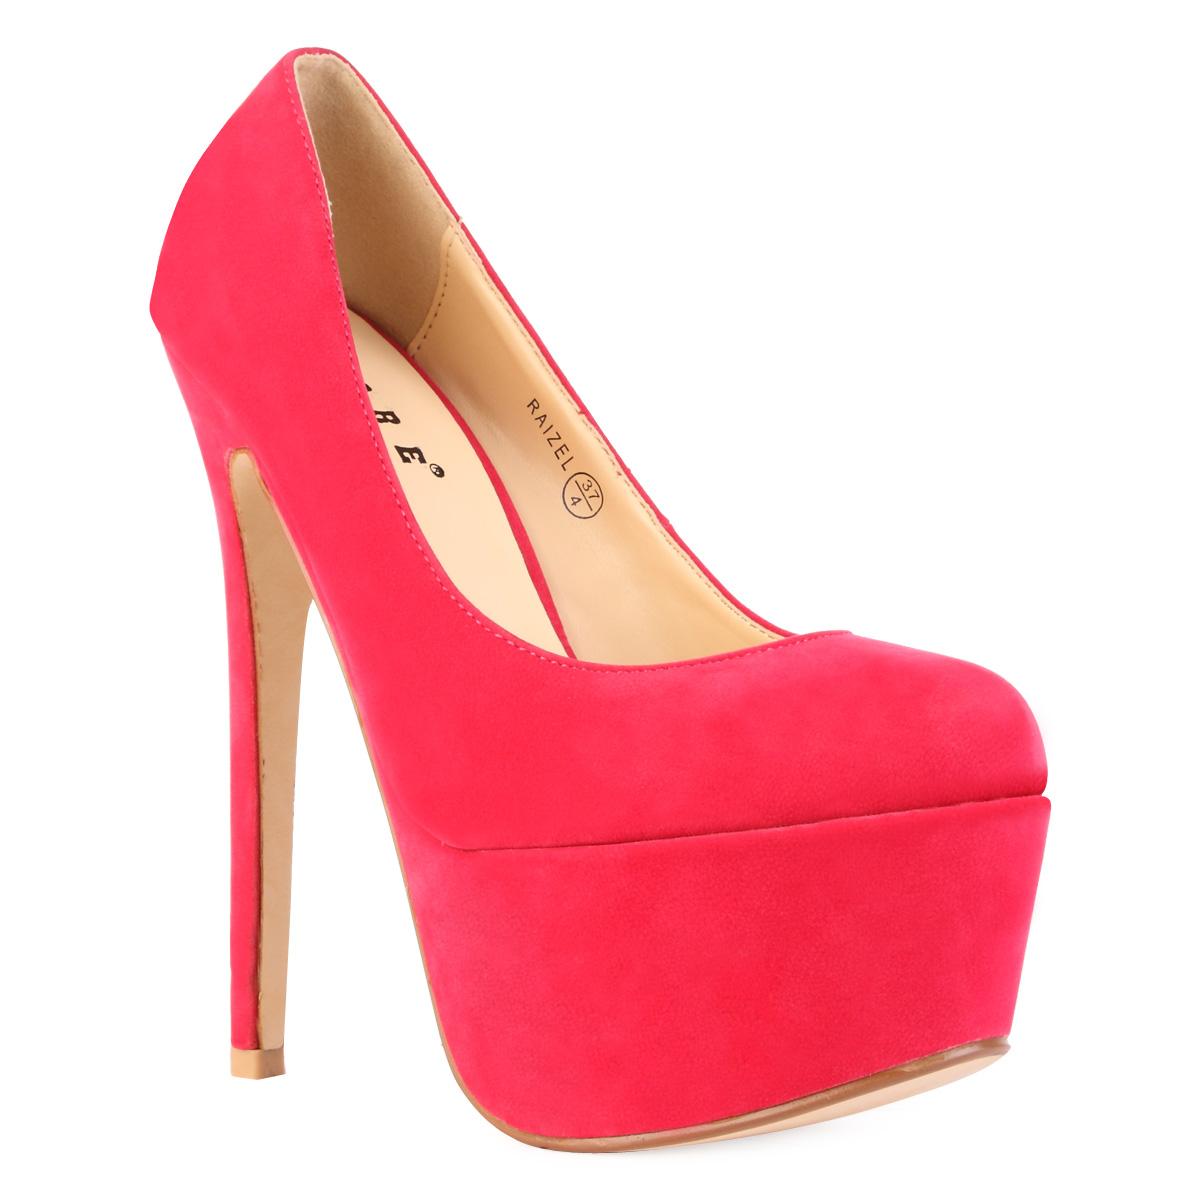 Chaussure Femme Rose Fuchsia Faux Daim Escarpin Compense